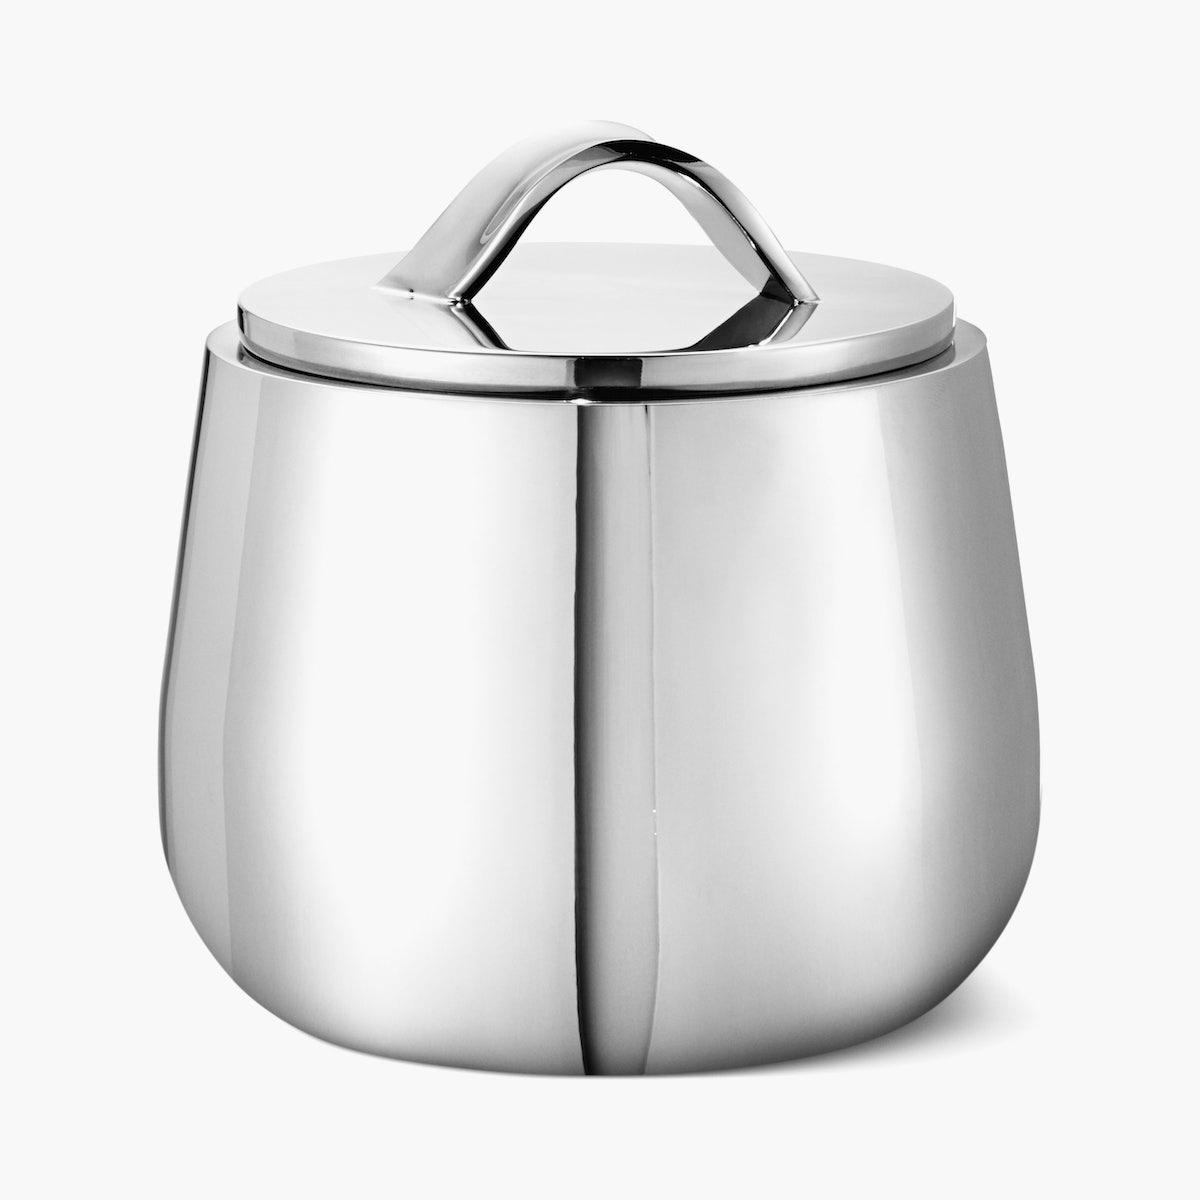 Helix Bonbonniere Bowl